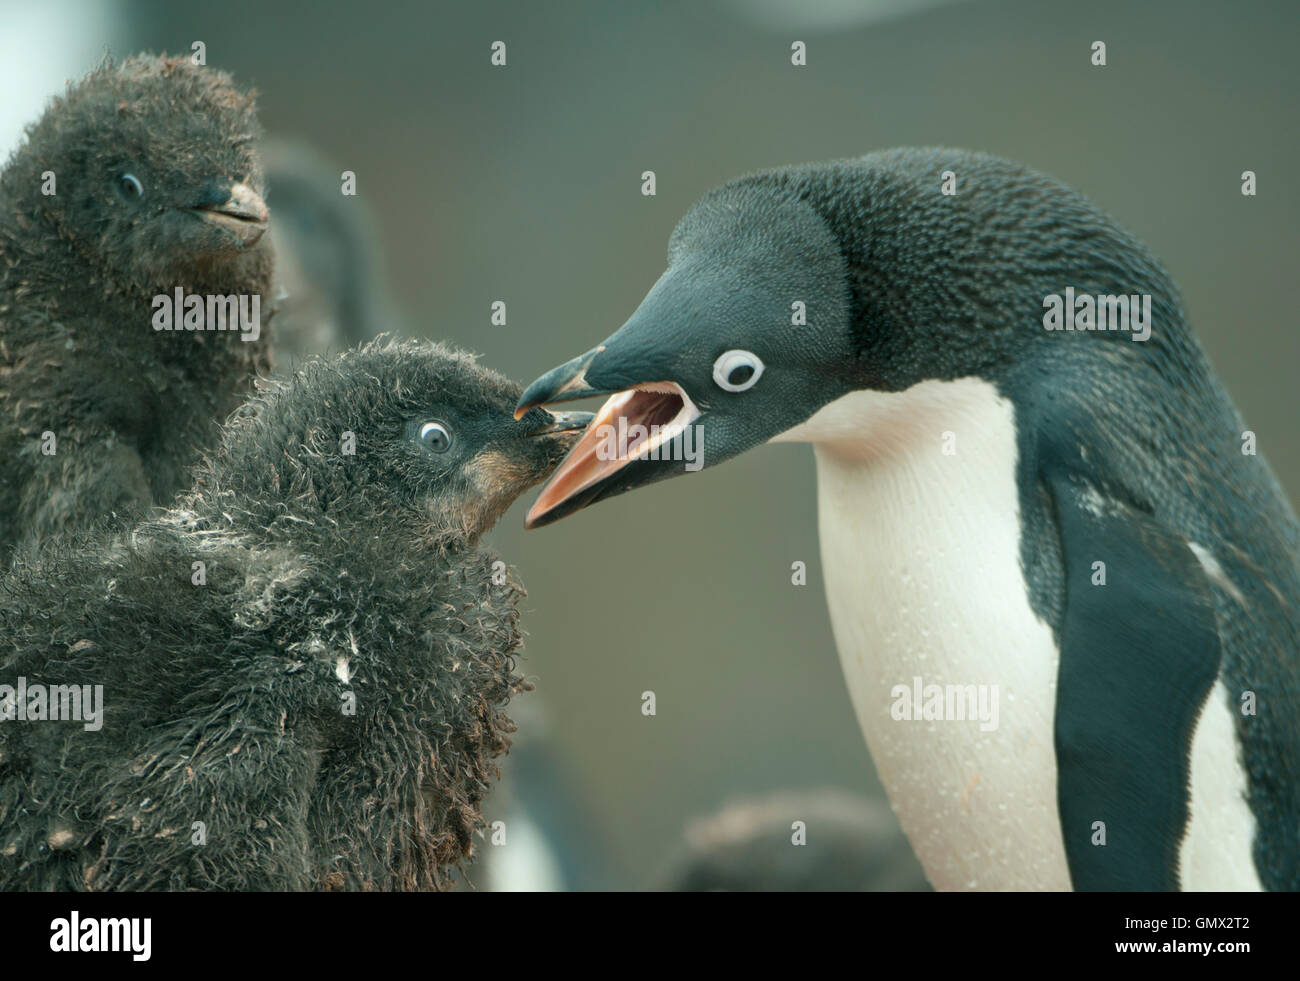 Adelie Penguin (Pygoscelis adeliae) feeding hungry chicks, Paulet Island, Antarctica - Stock Image